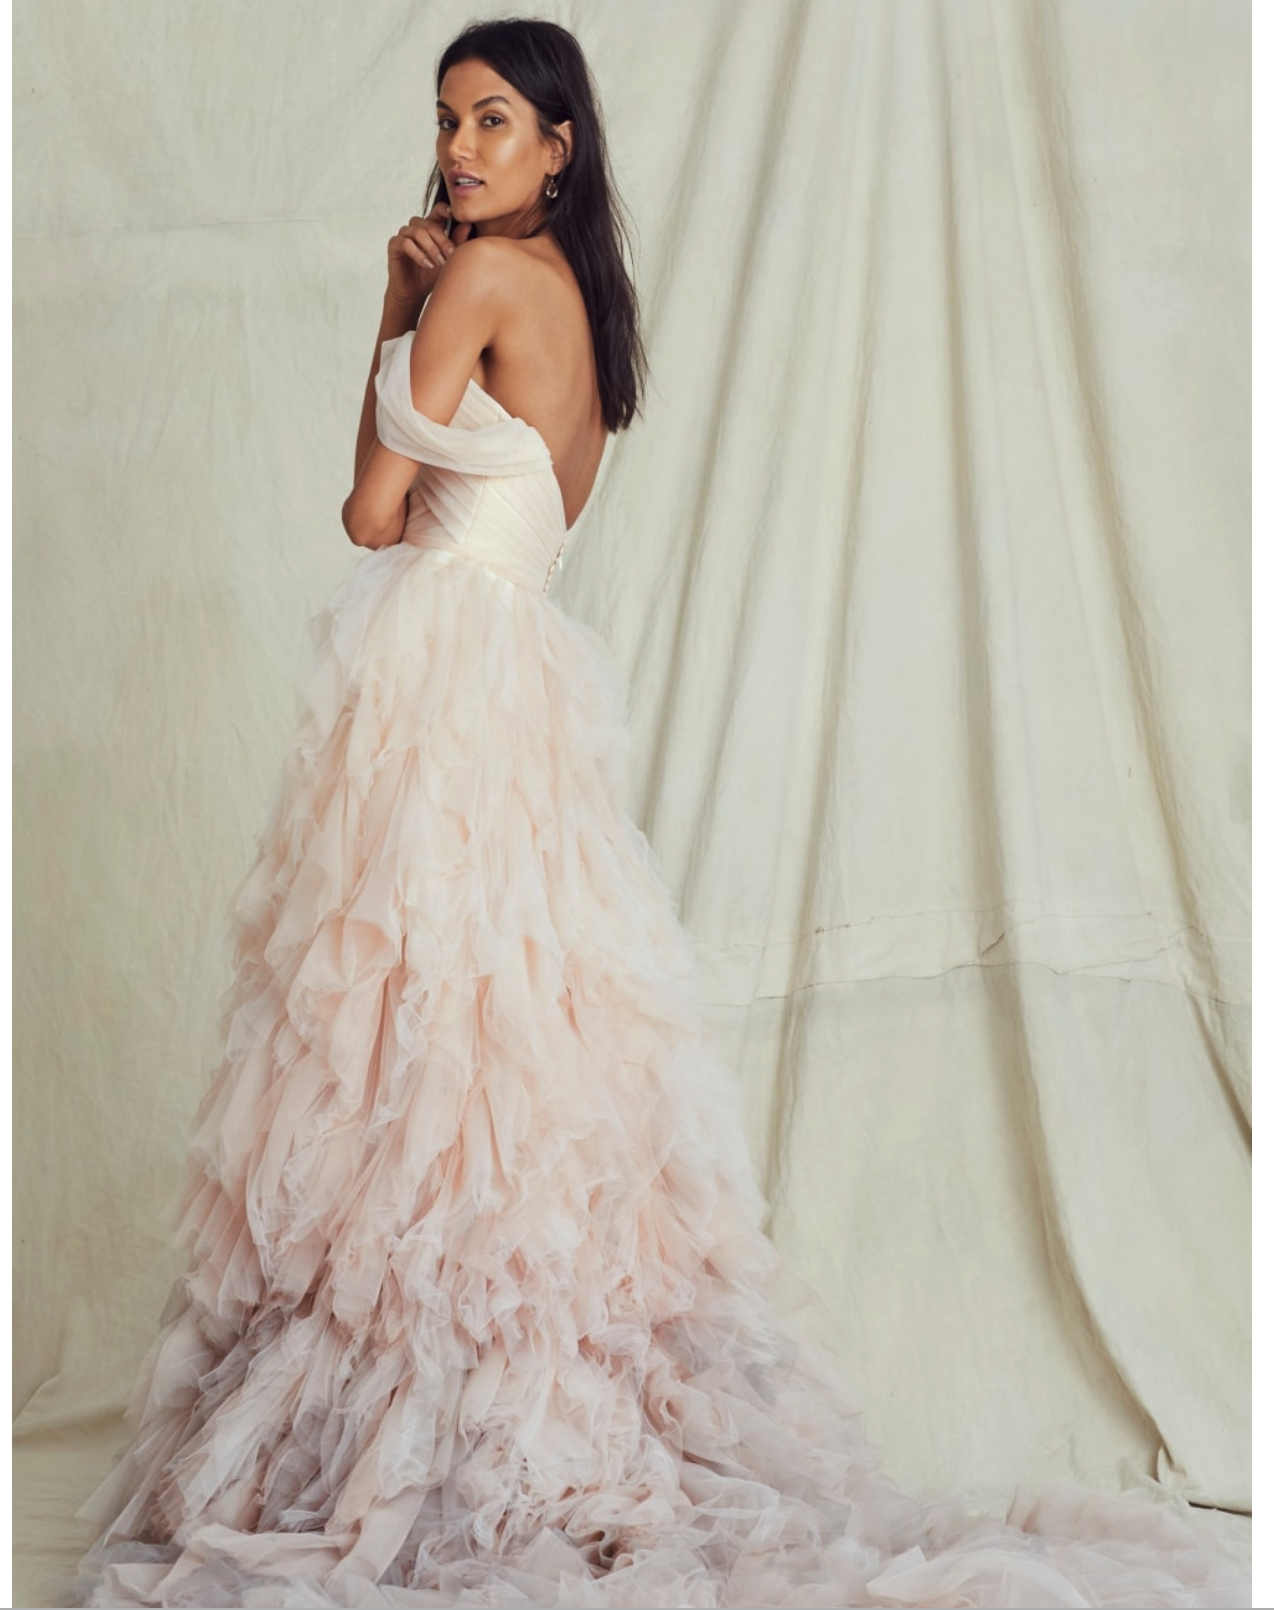 Uma by Kelly Faetanini Carousel Fall 2019 Collection available at FBM Bridal Image Courtesy KellyFaetanini.com